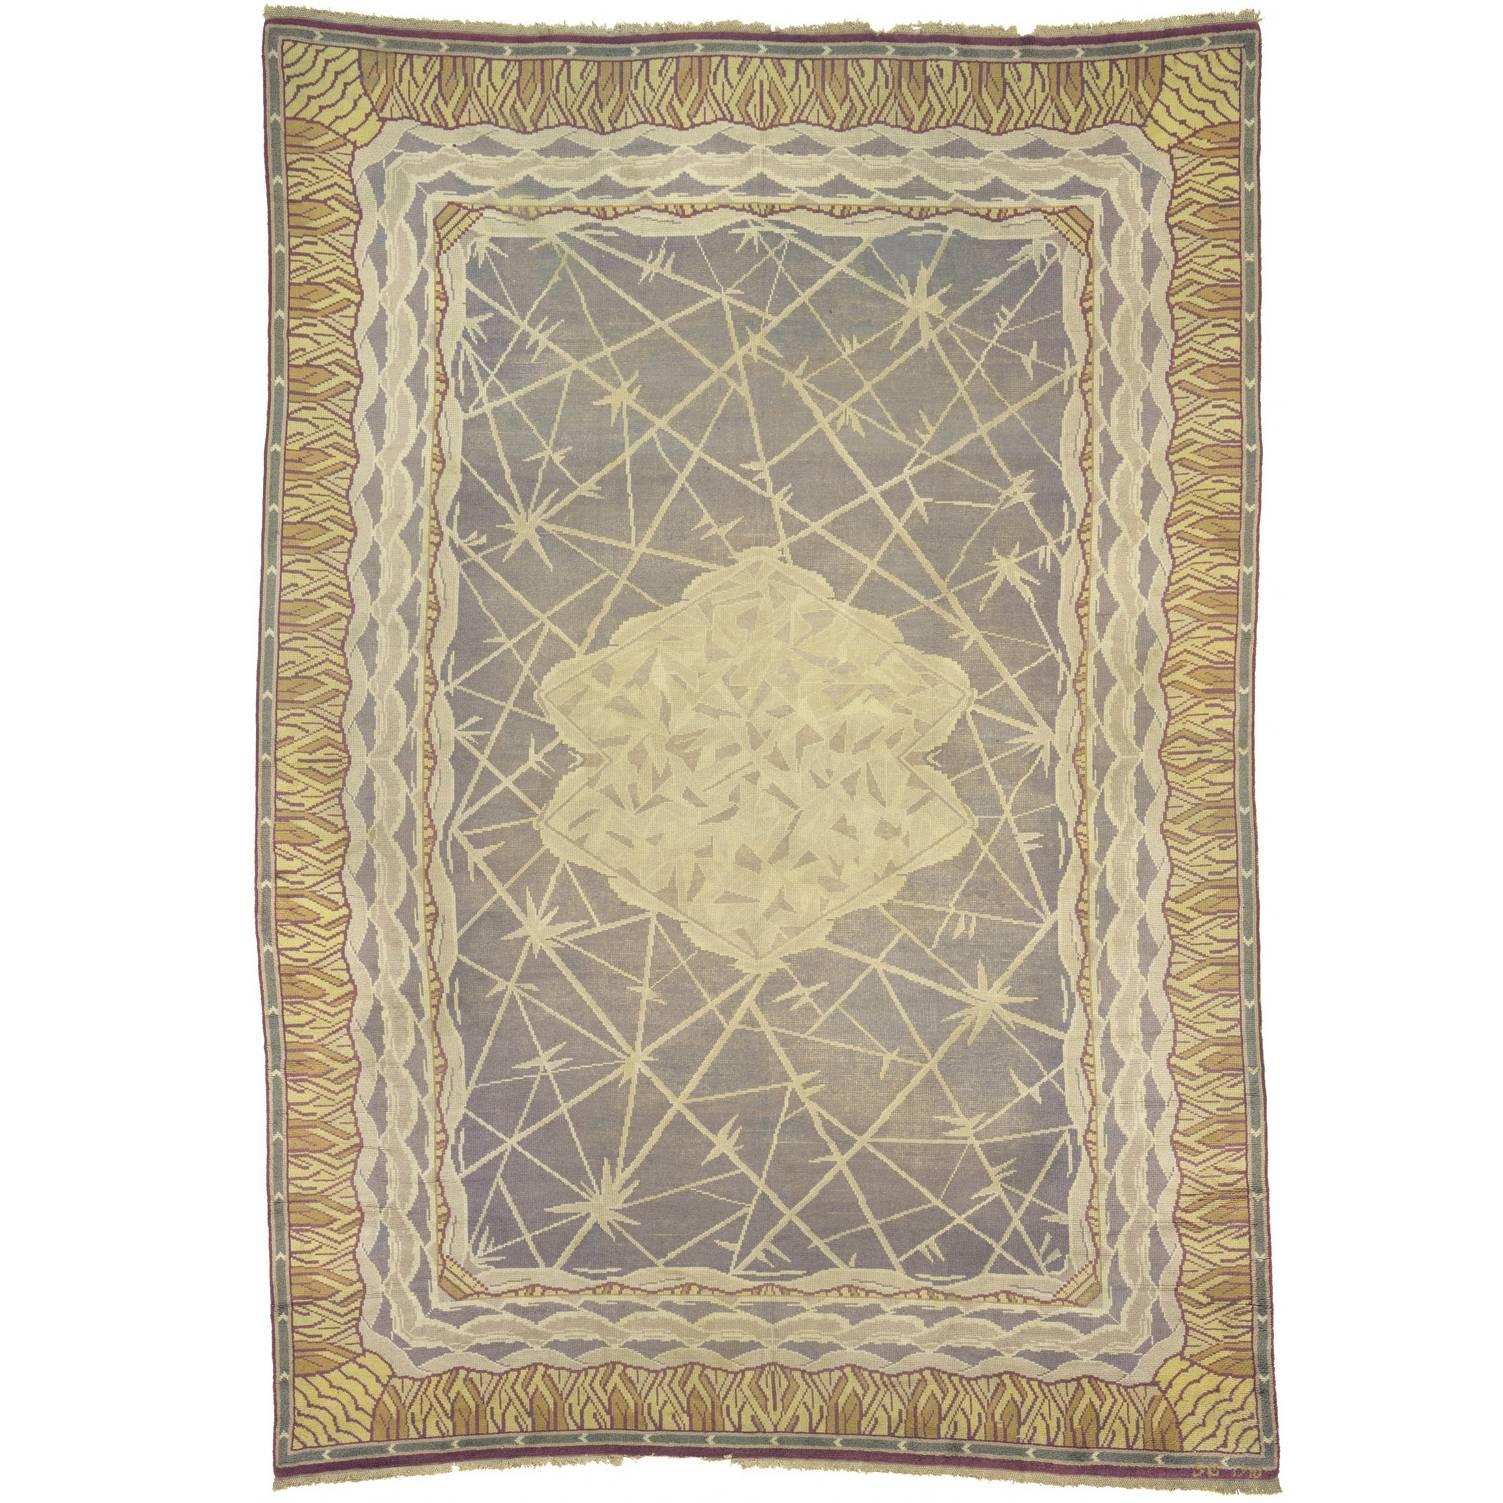 Early-20th Century Swedish Pile-Weave Carpet by Selma Giobel